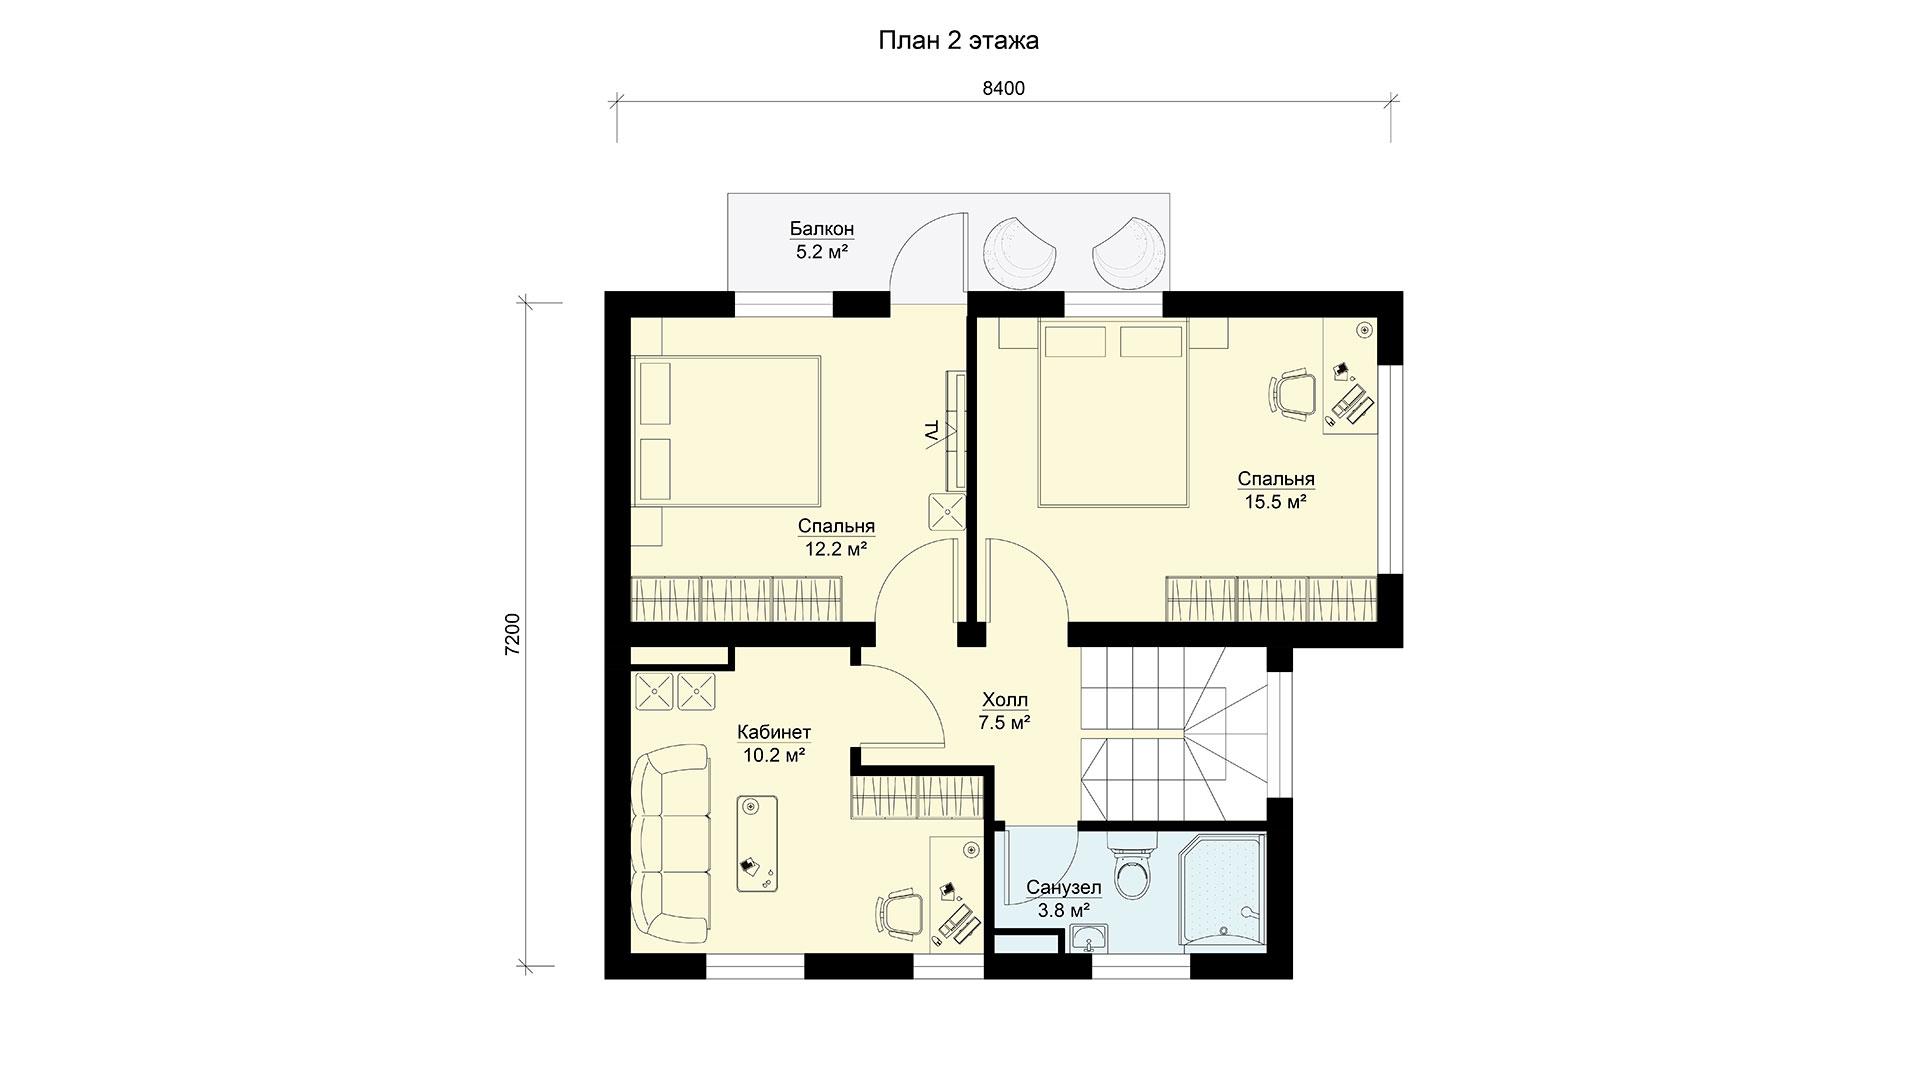 План второго этажа двухэтажного дома БЭНПАН, проект БП-112.